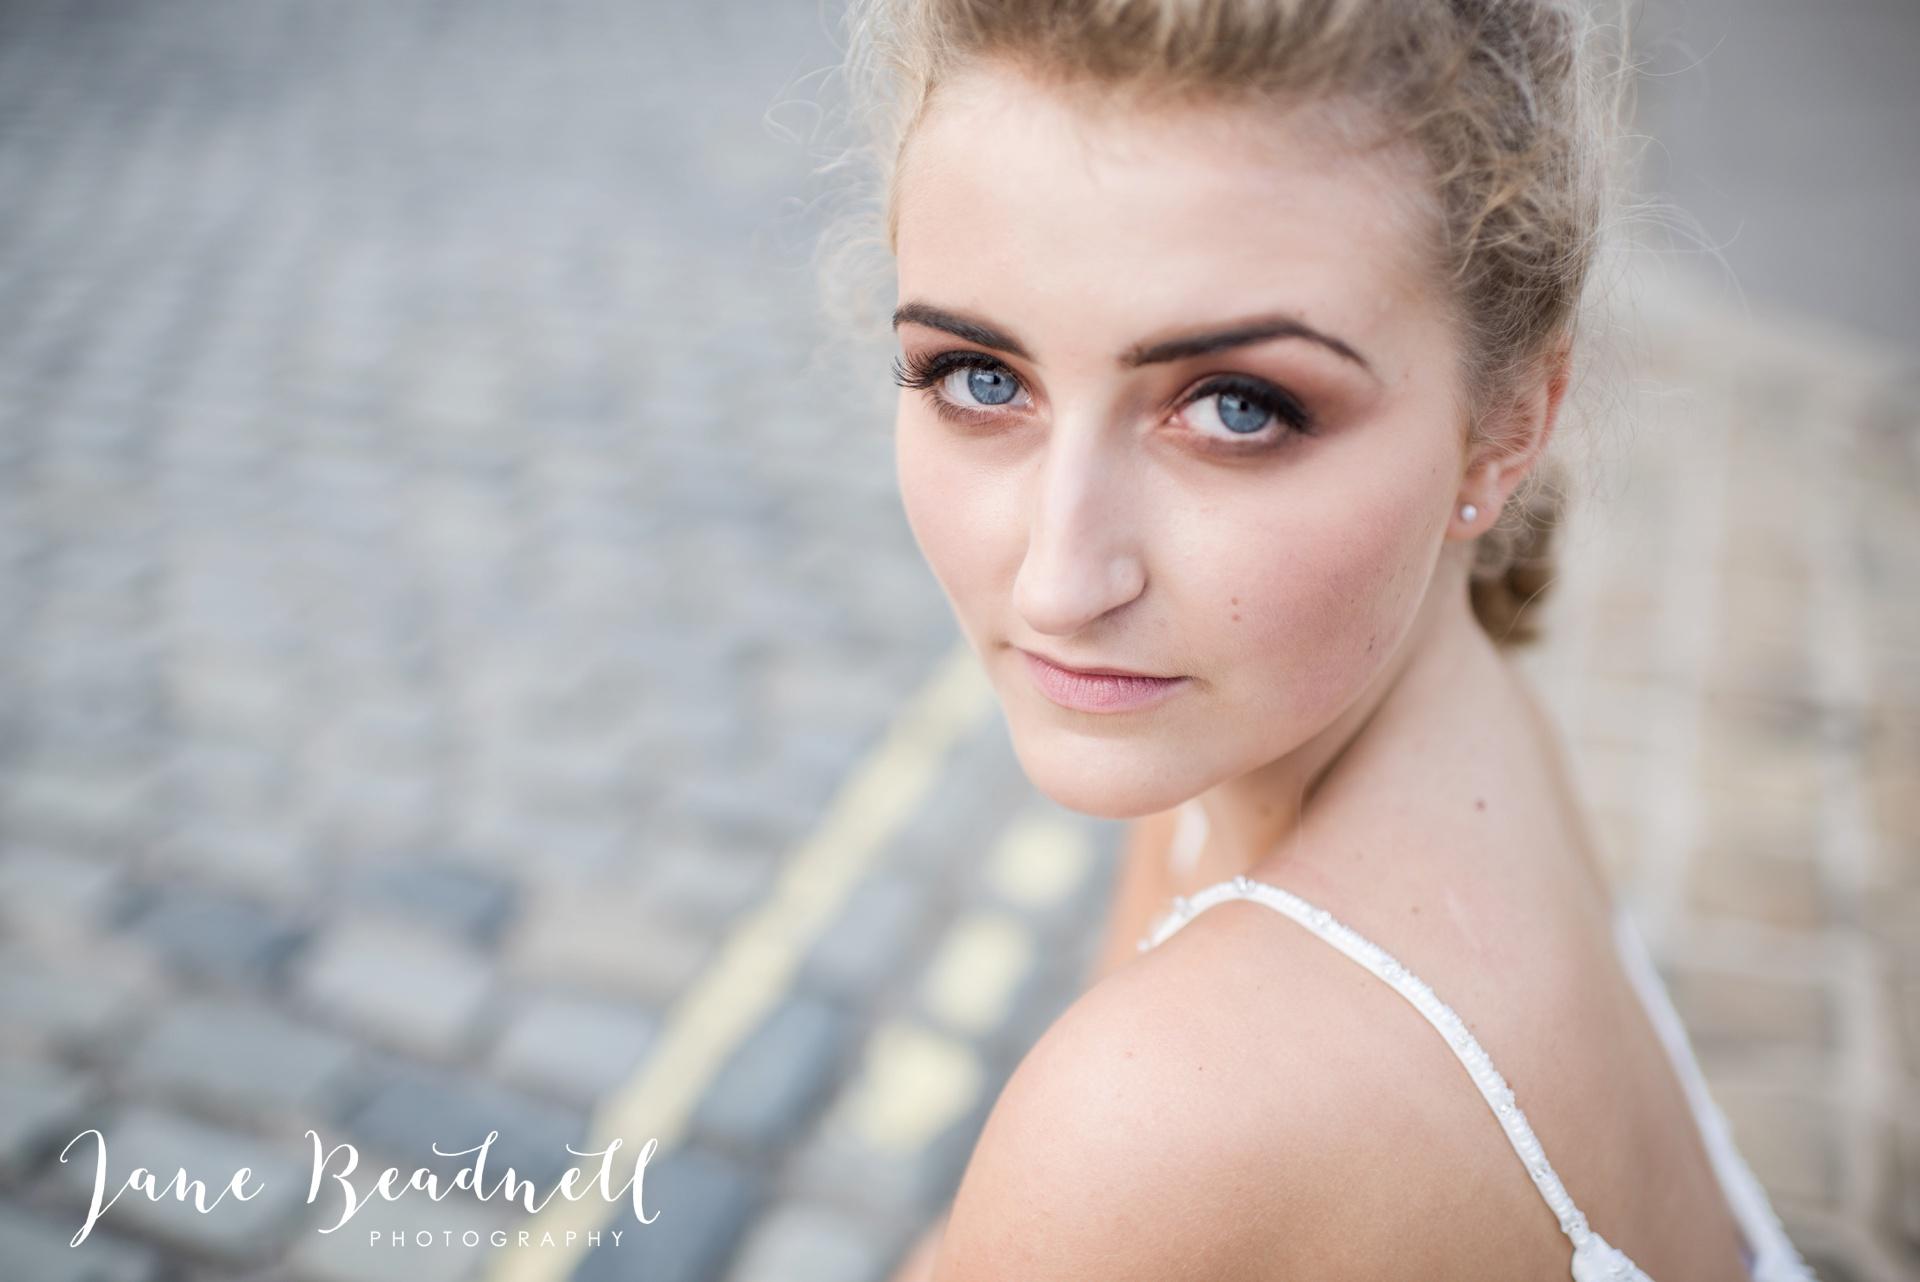 leafy-couture-wedding-flowers-otley-fine-art-wedding-photographer-jane-beadnell-photography_0012